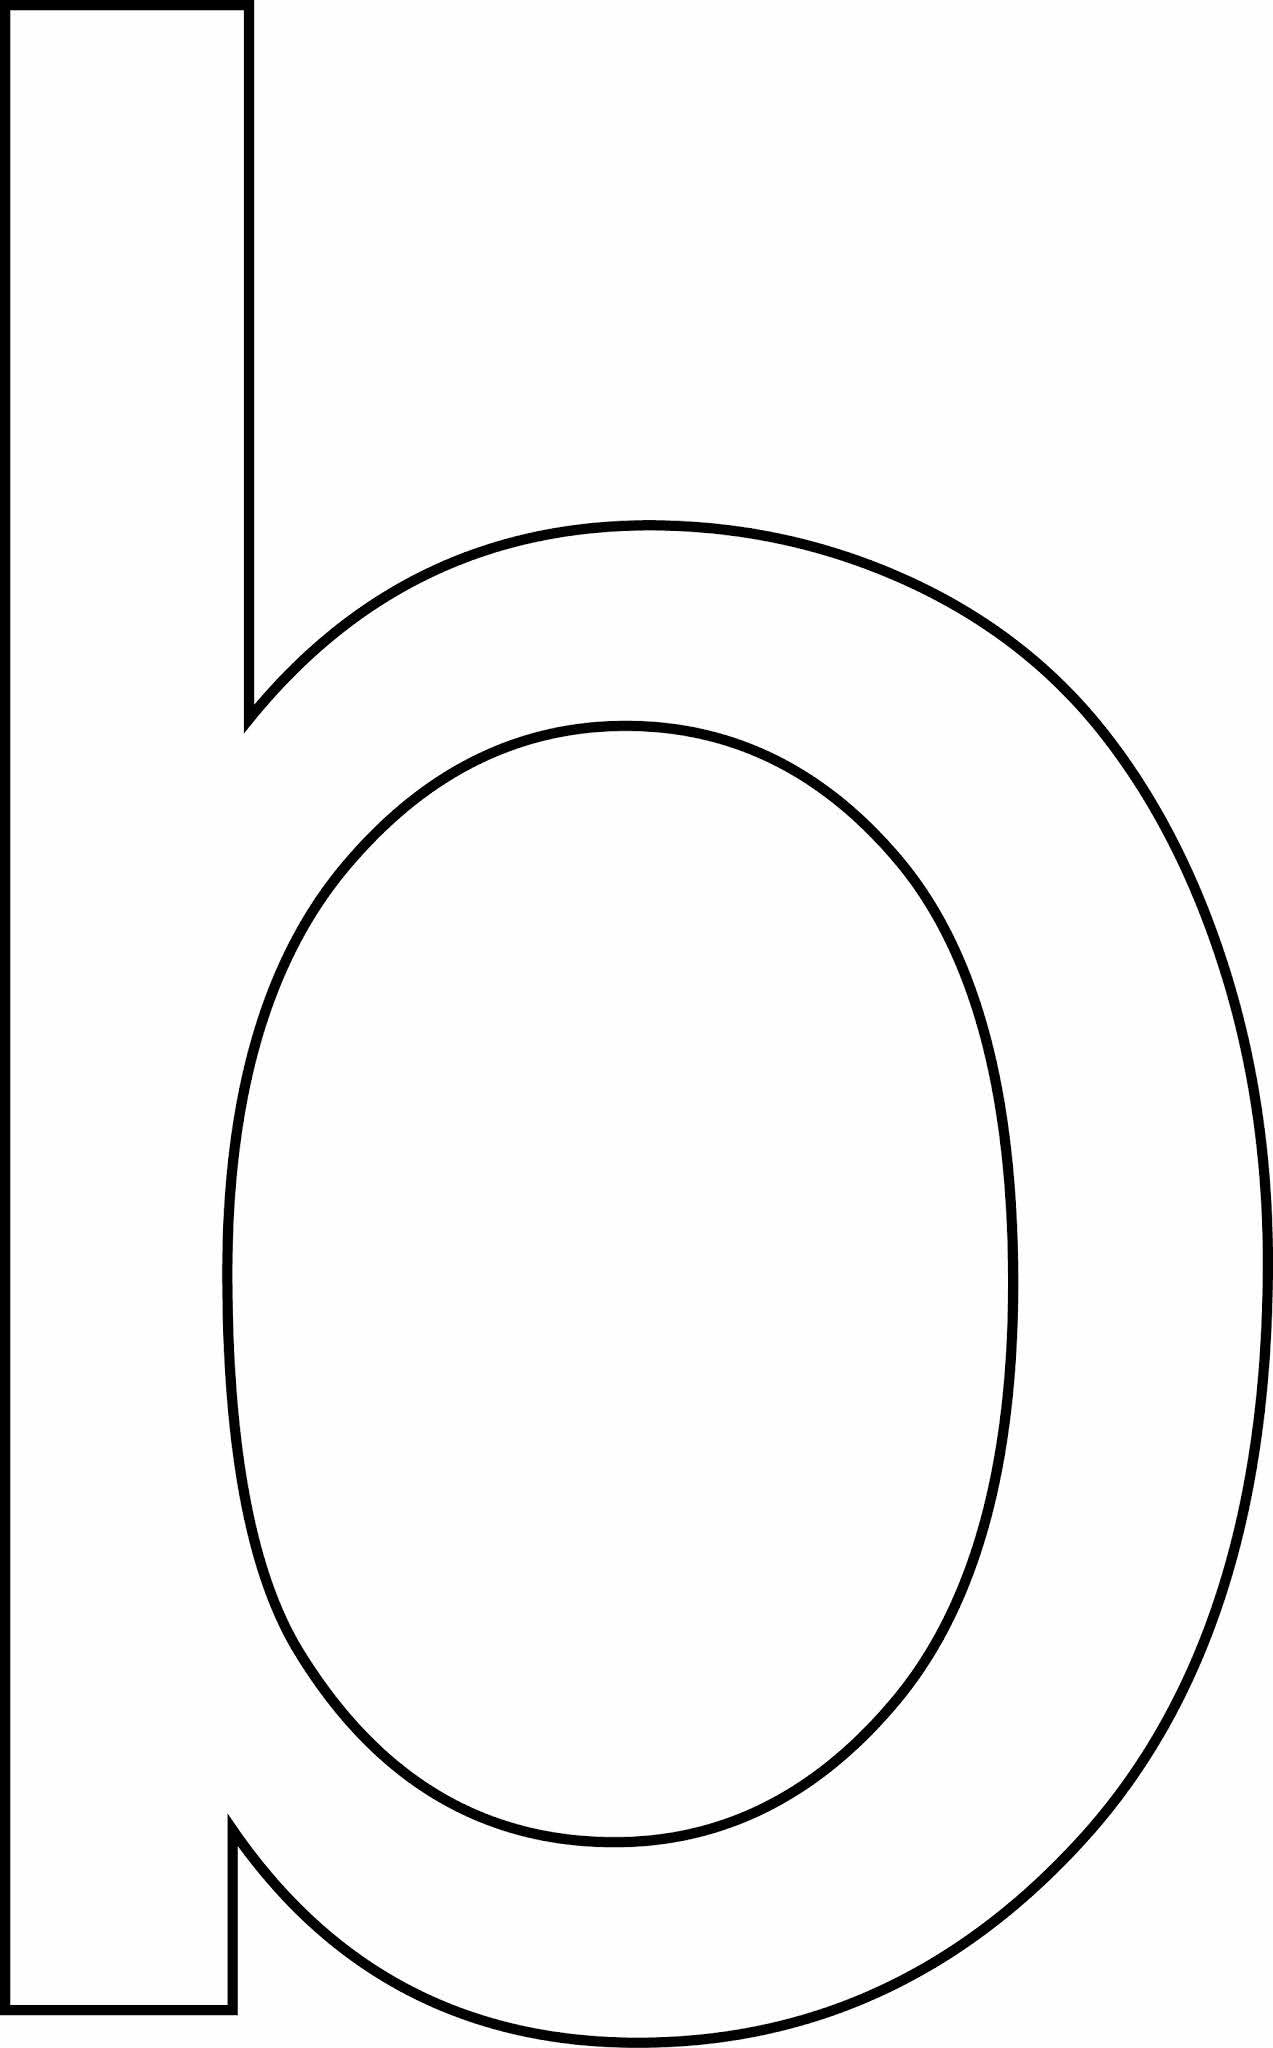 Letra b - minúscula para imprimir